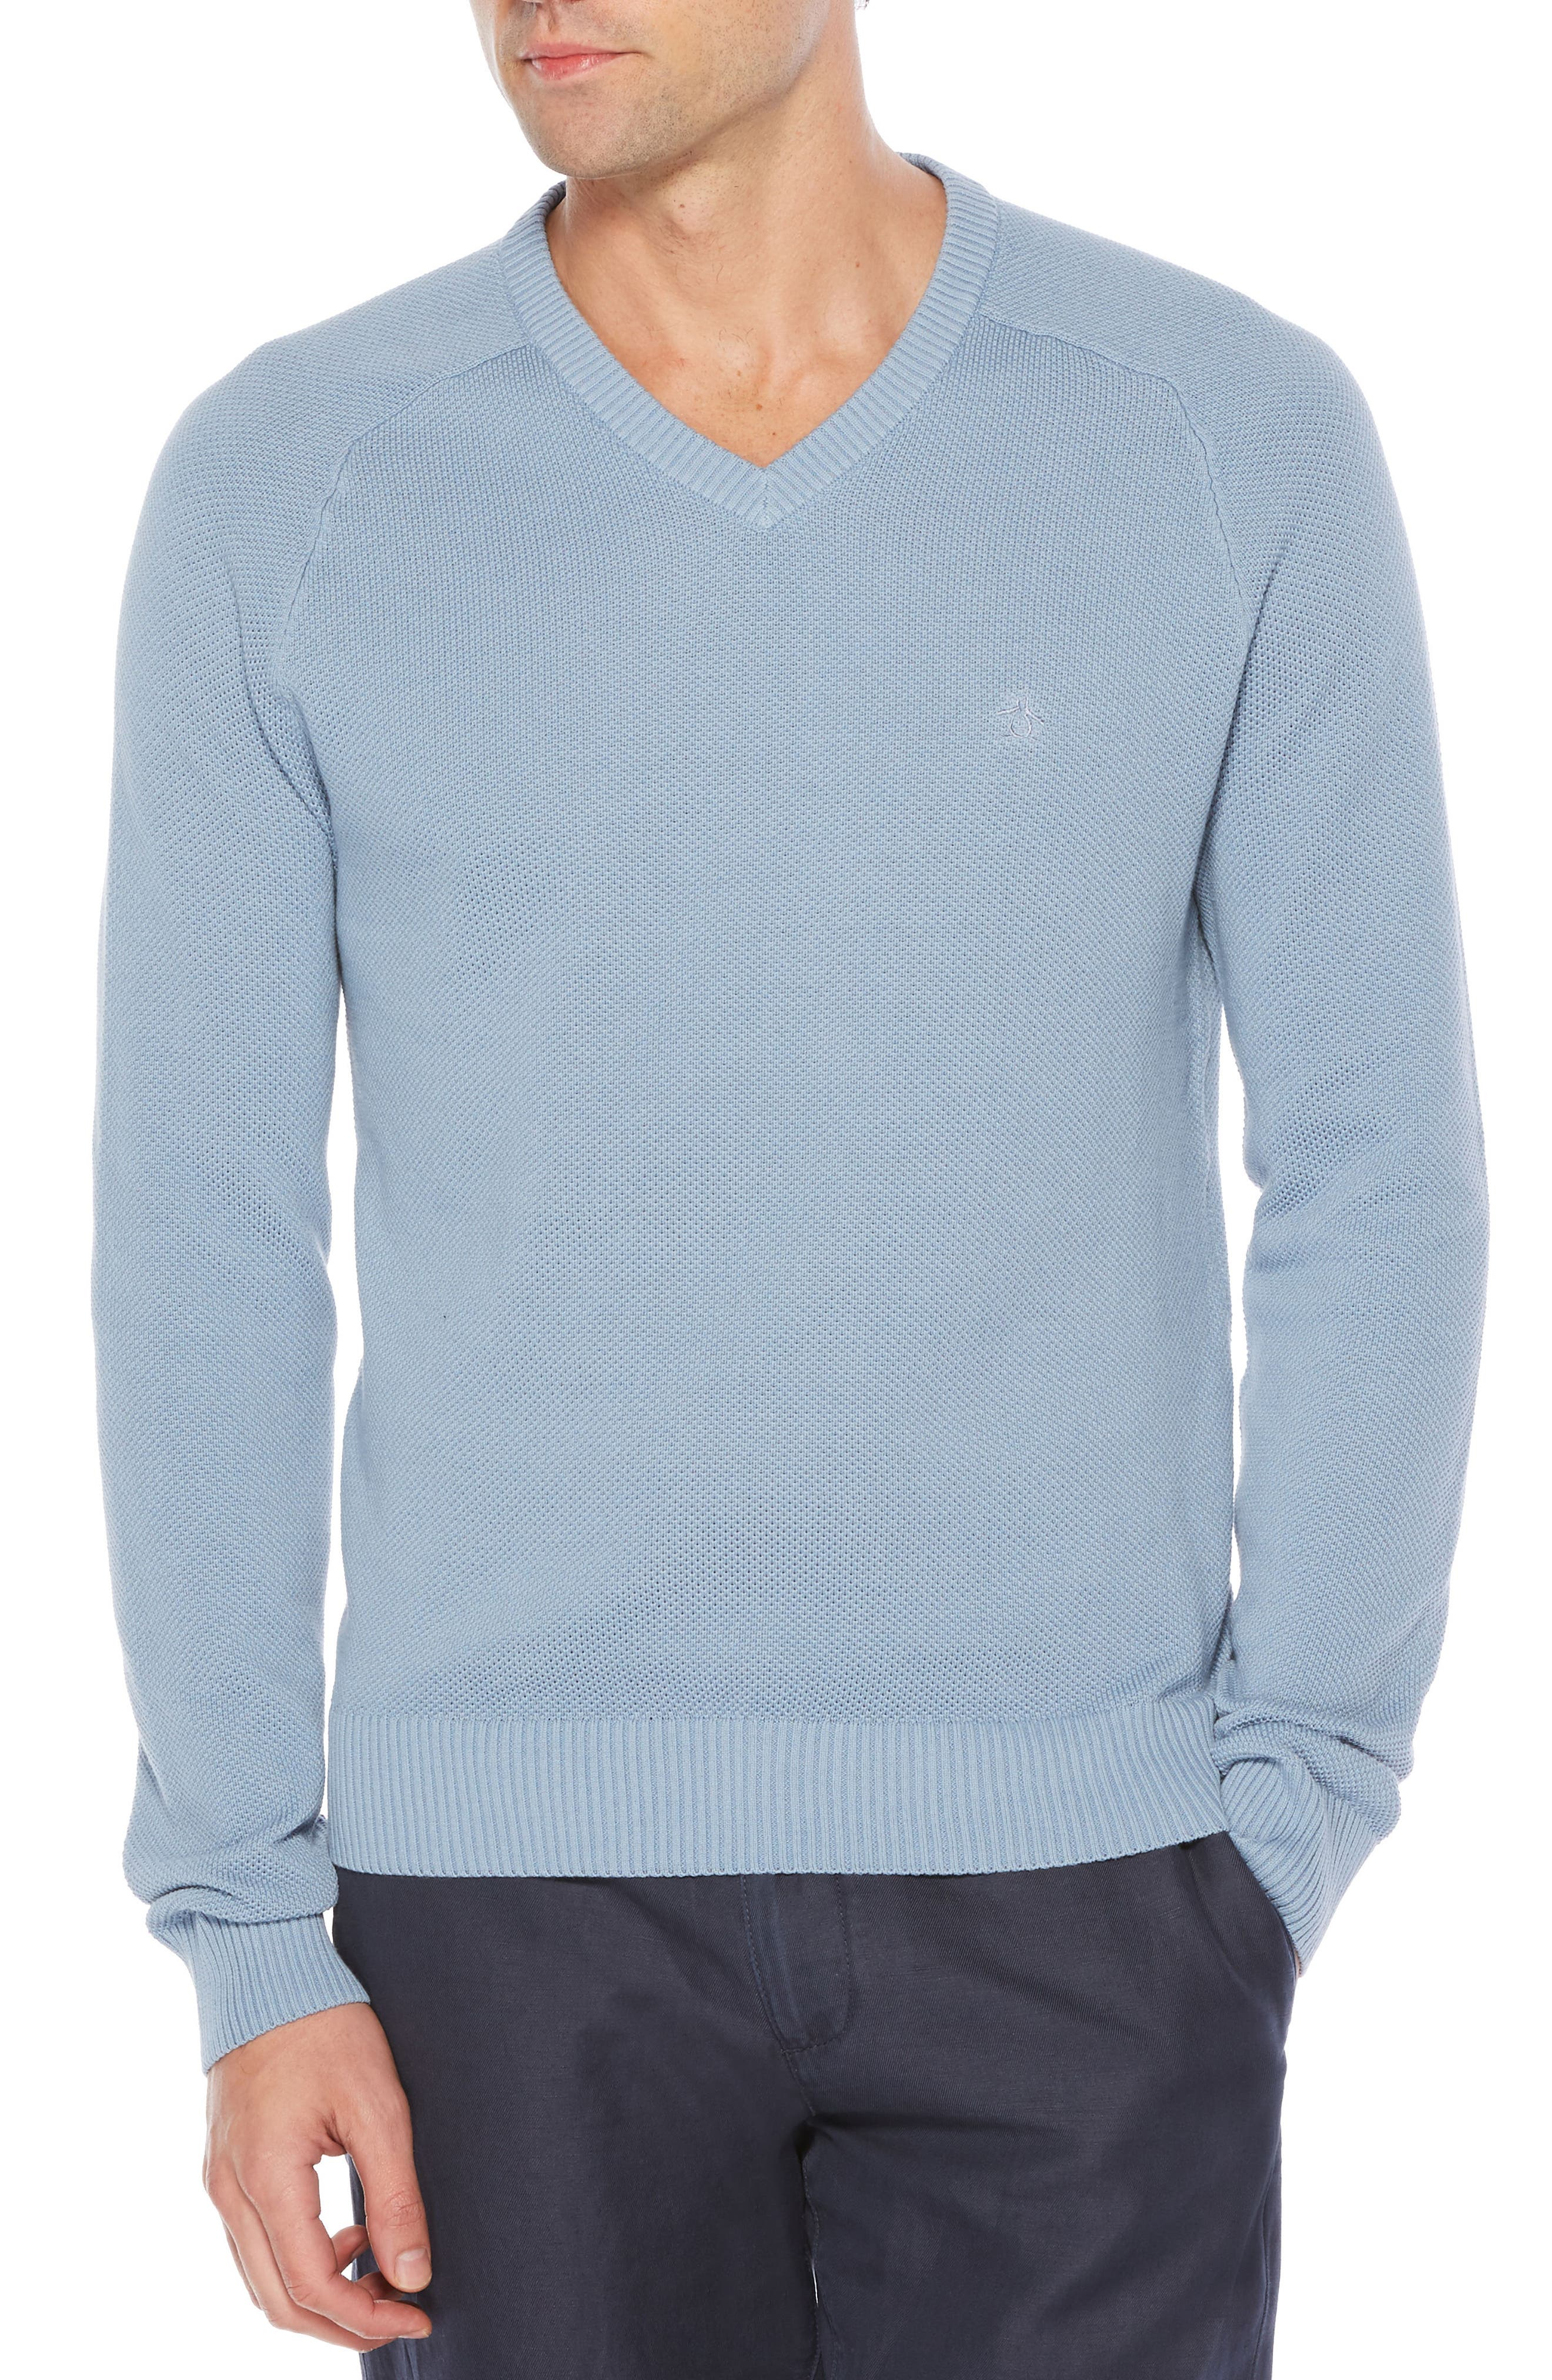 Piqué V-Neck Sweater,                             Main thumbnail 1, color,                             Steel Grey